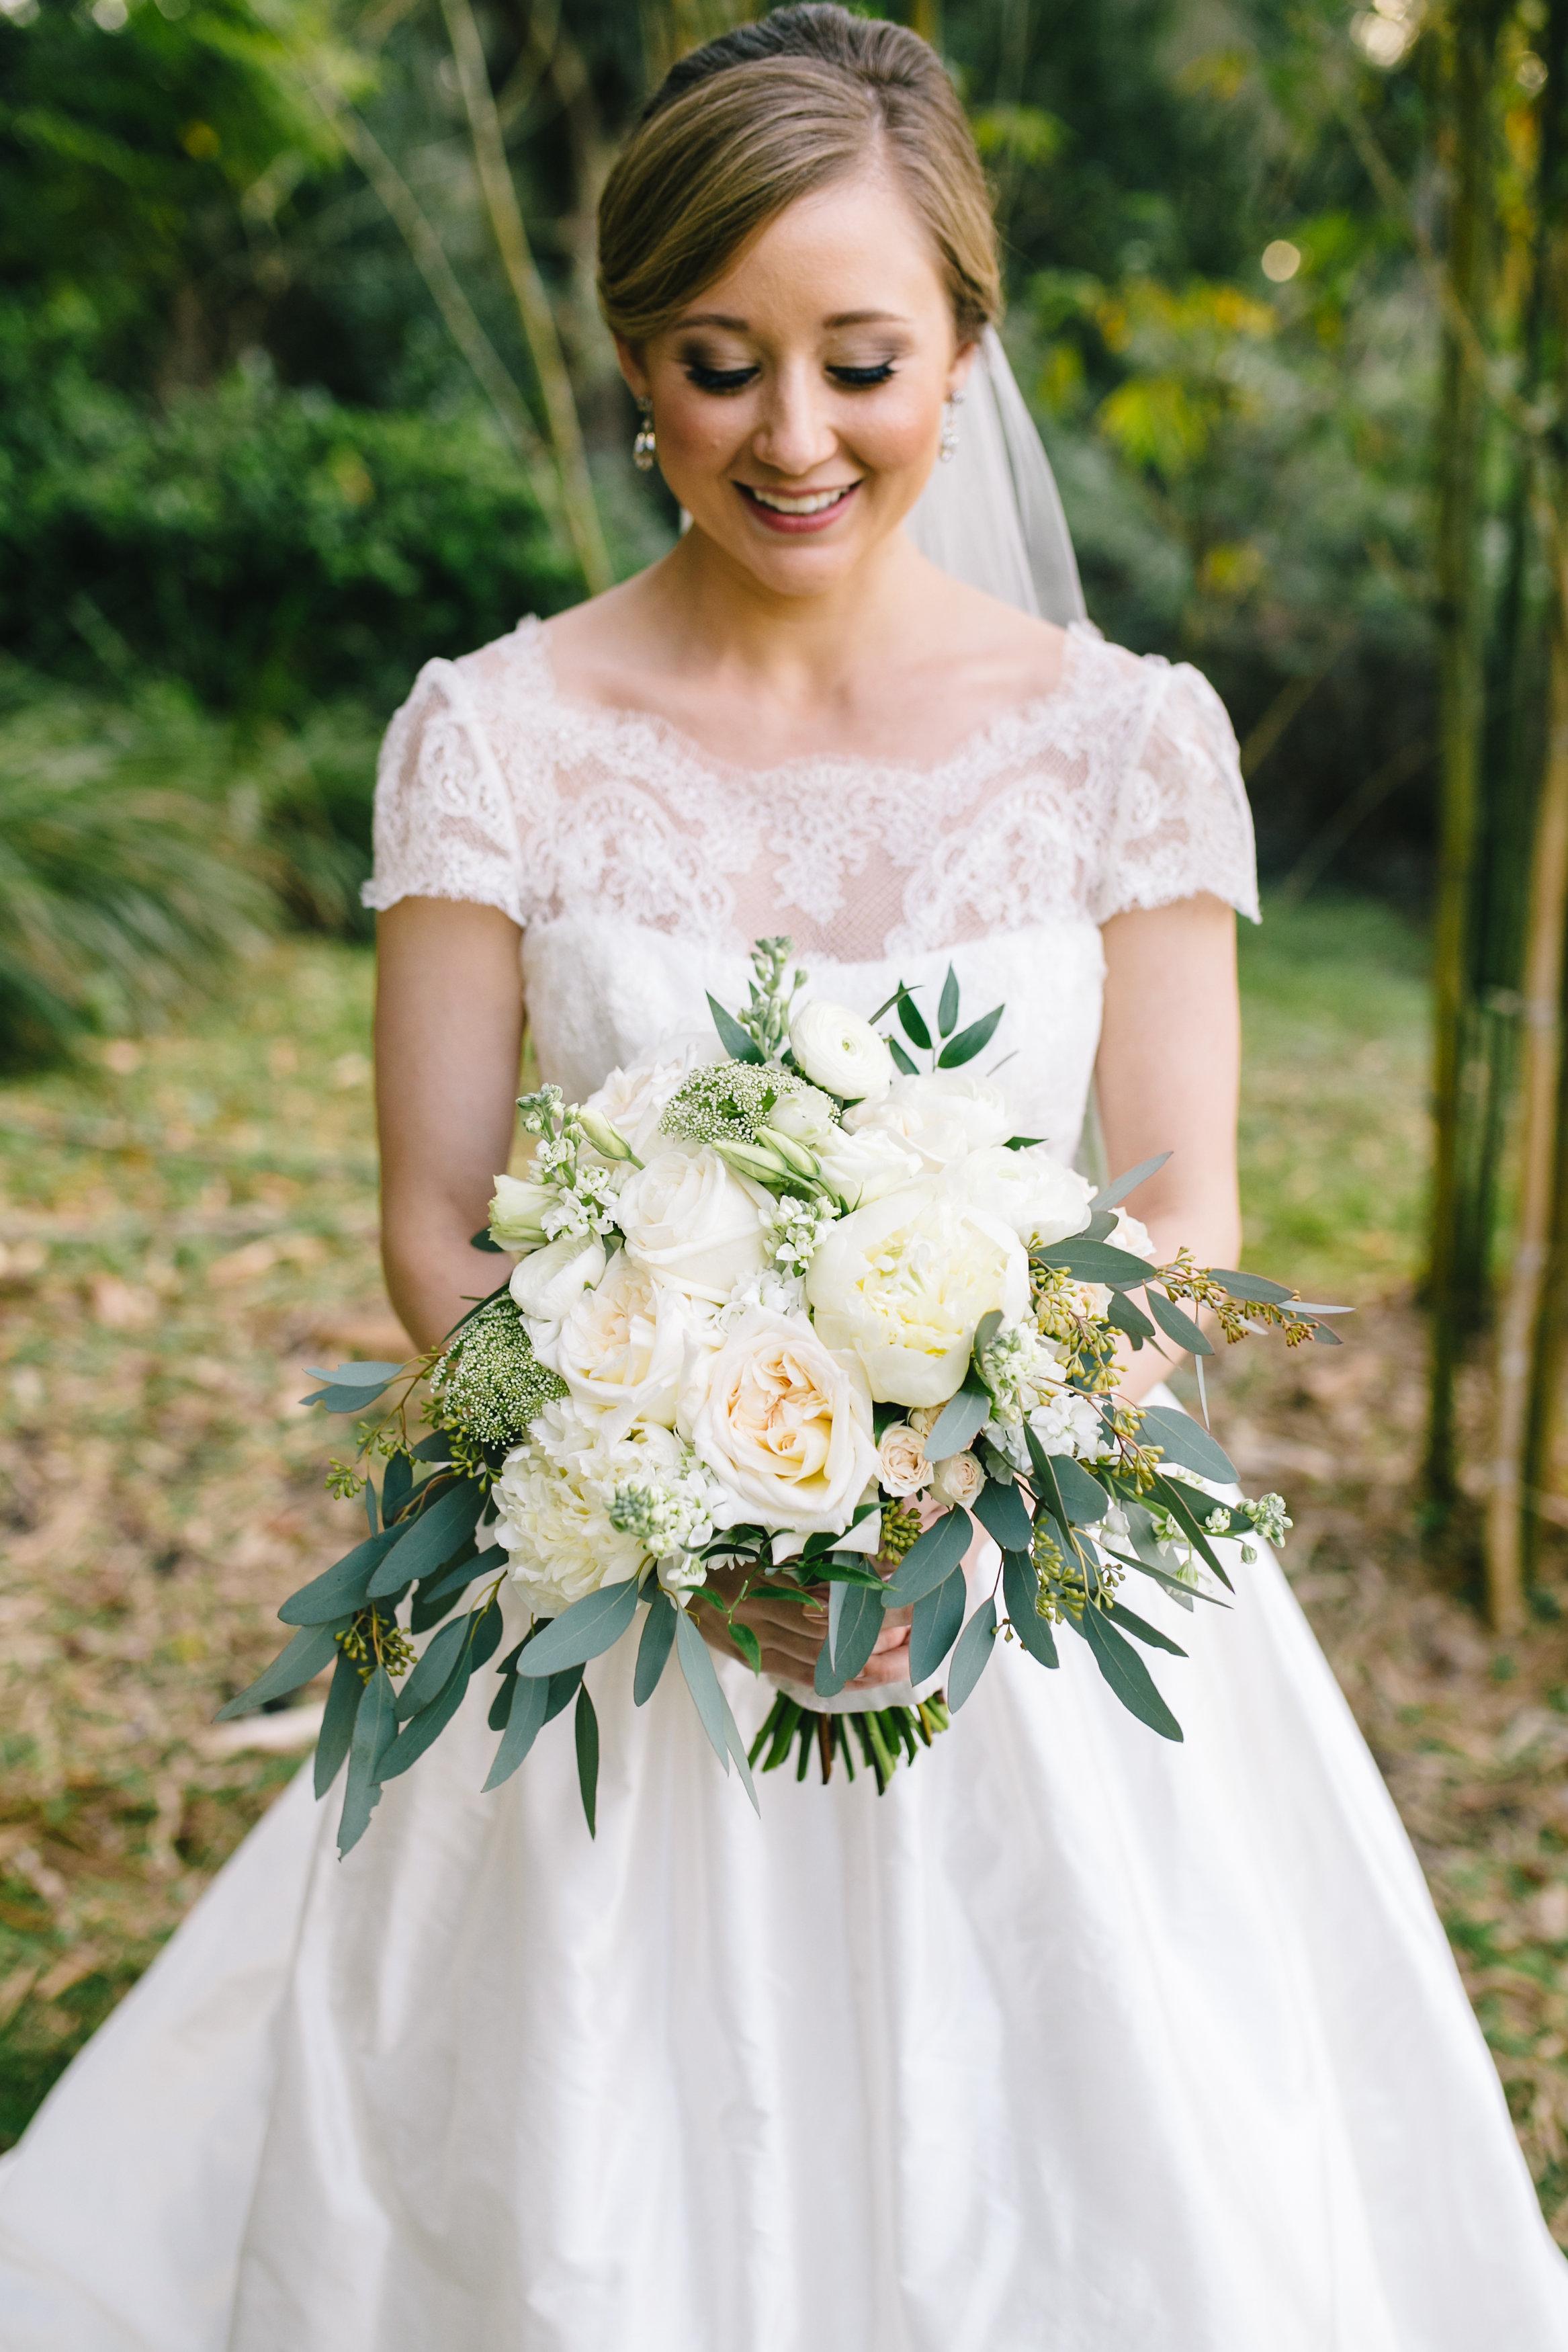 Bridal bouquet full of garden roses